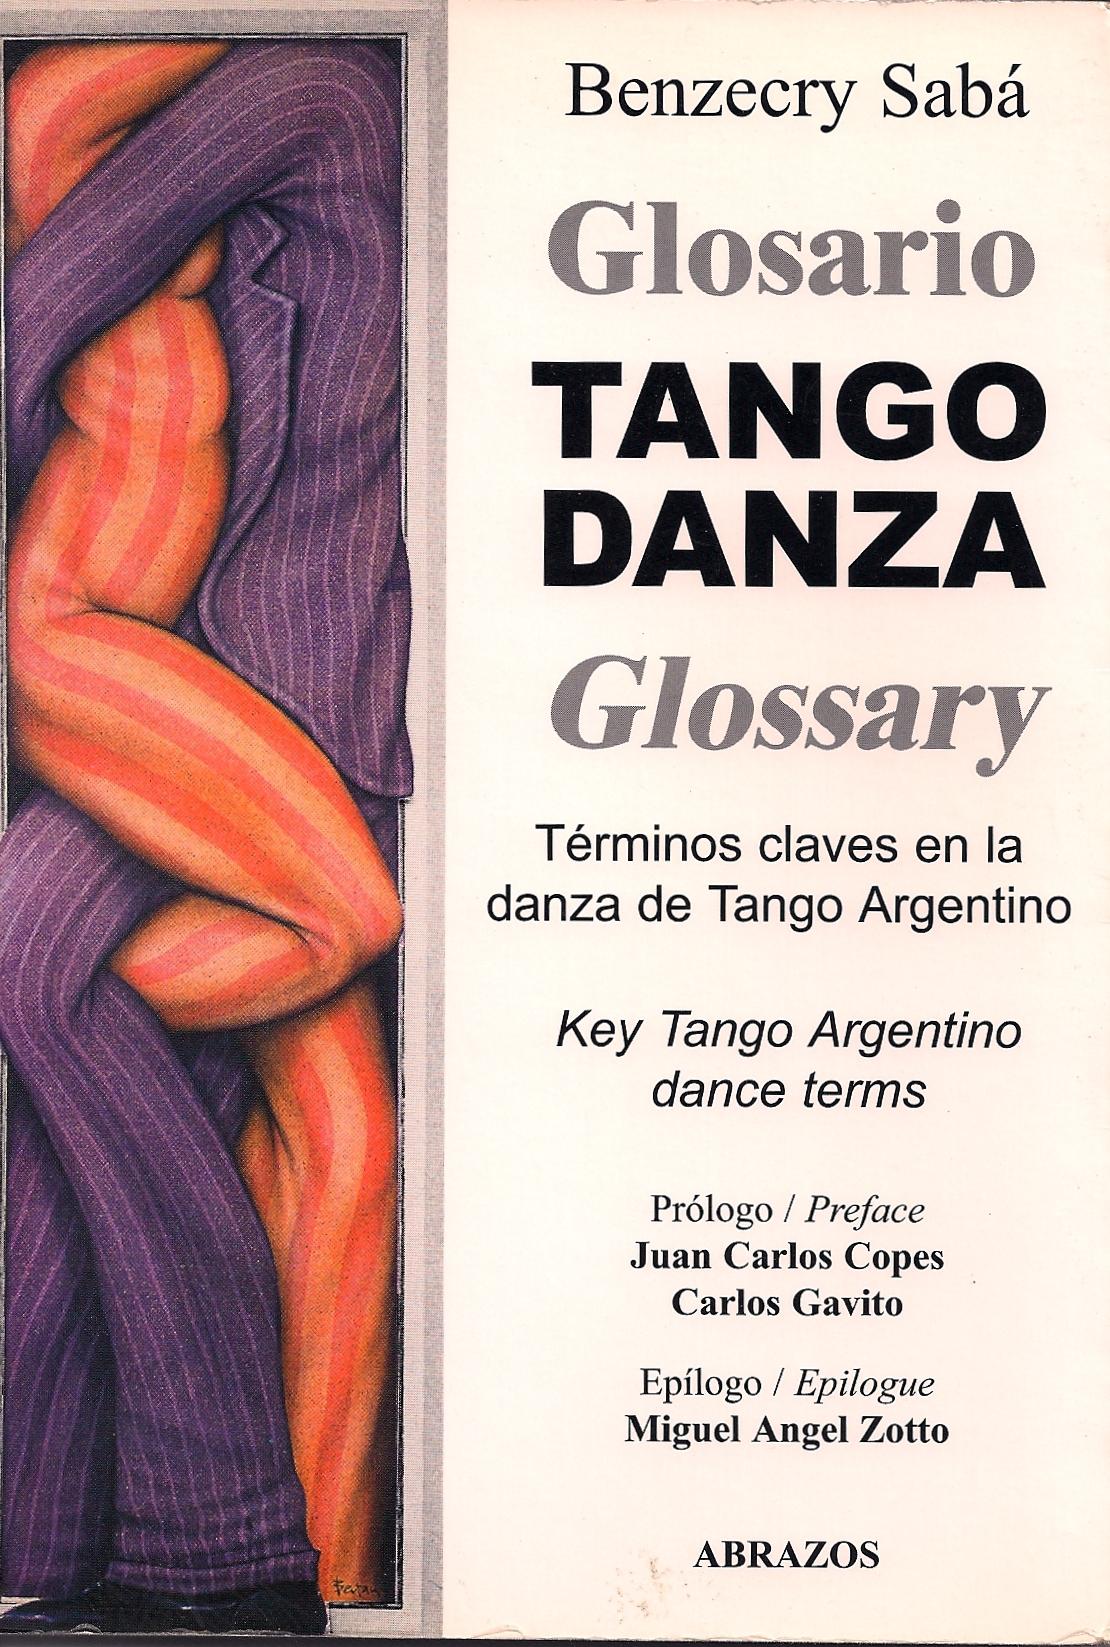 Tango danza glossary